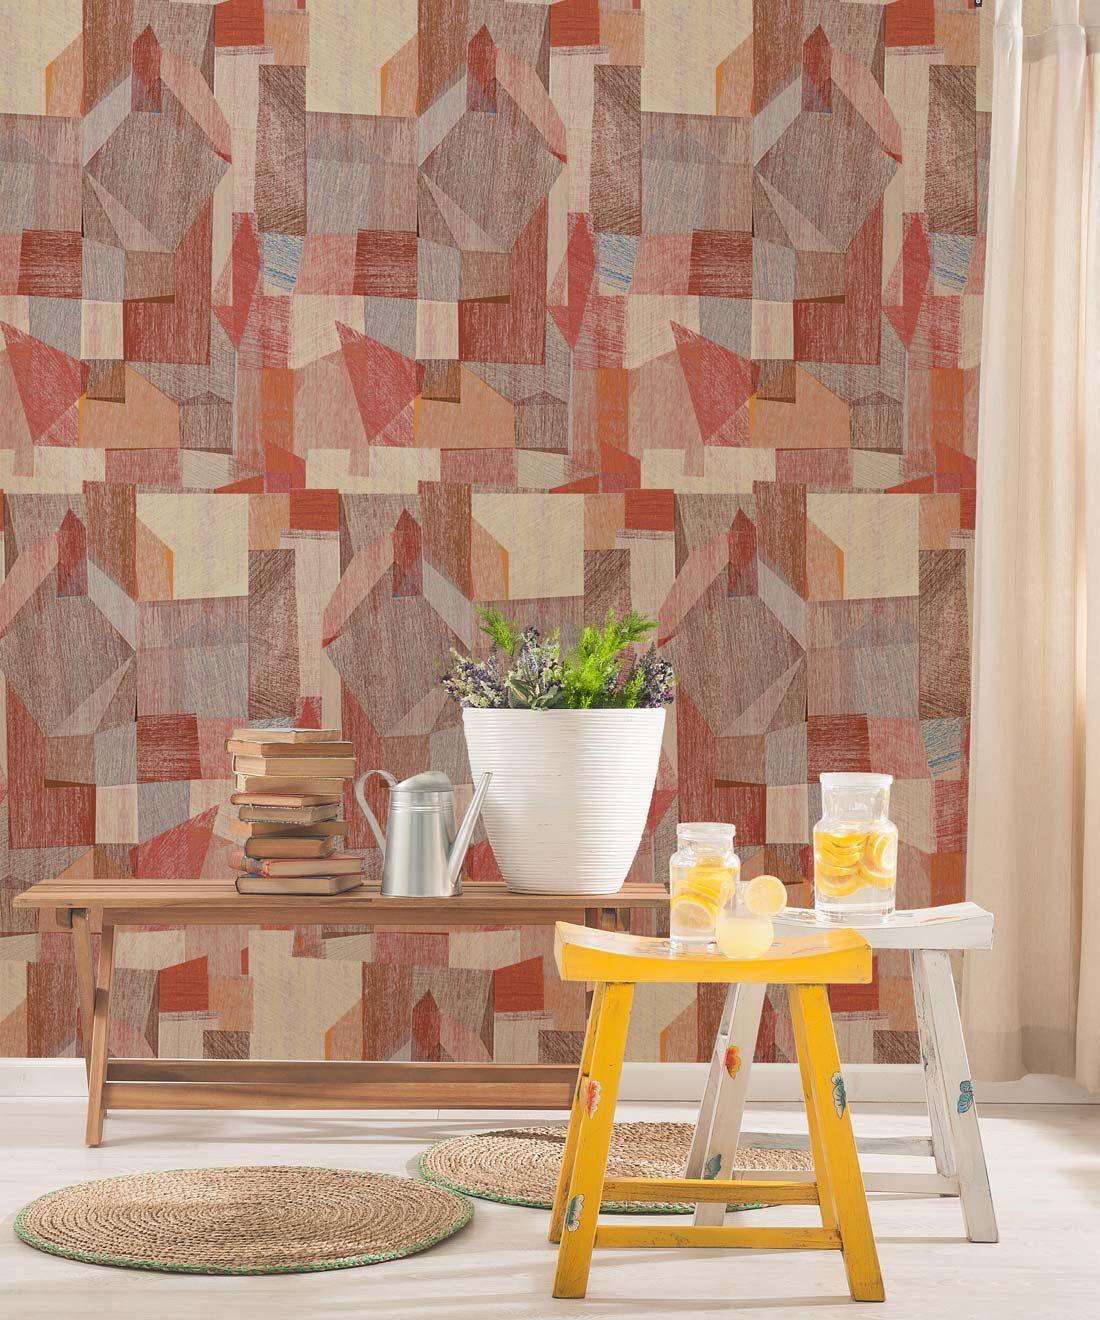 Chimera Wallpaper Colourful Abstract Wallpaper Milton King Uk In 2020 Abstract Wallpaper Wallpaper Shop Wallpaper